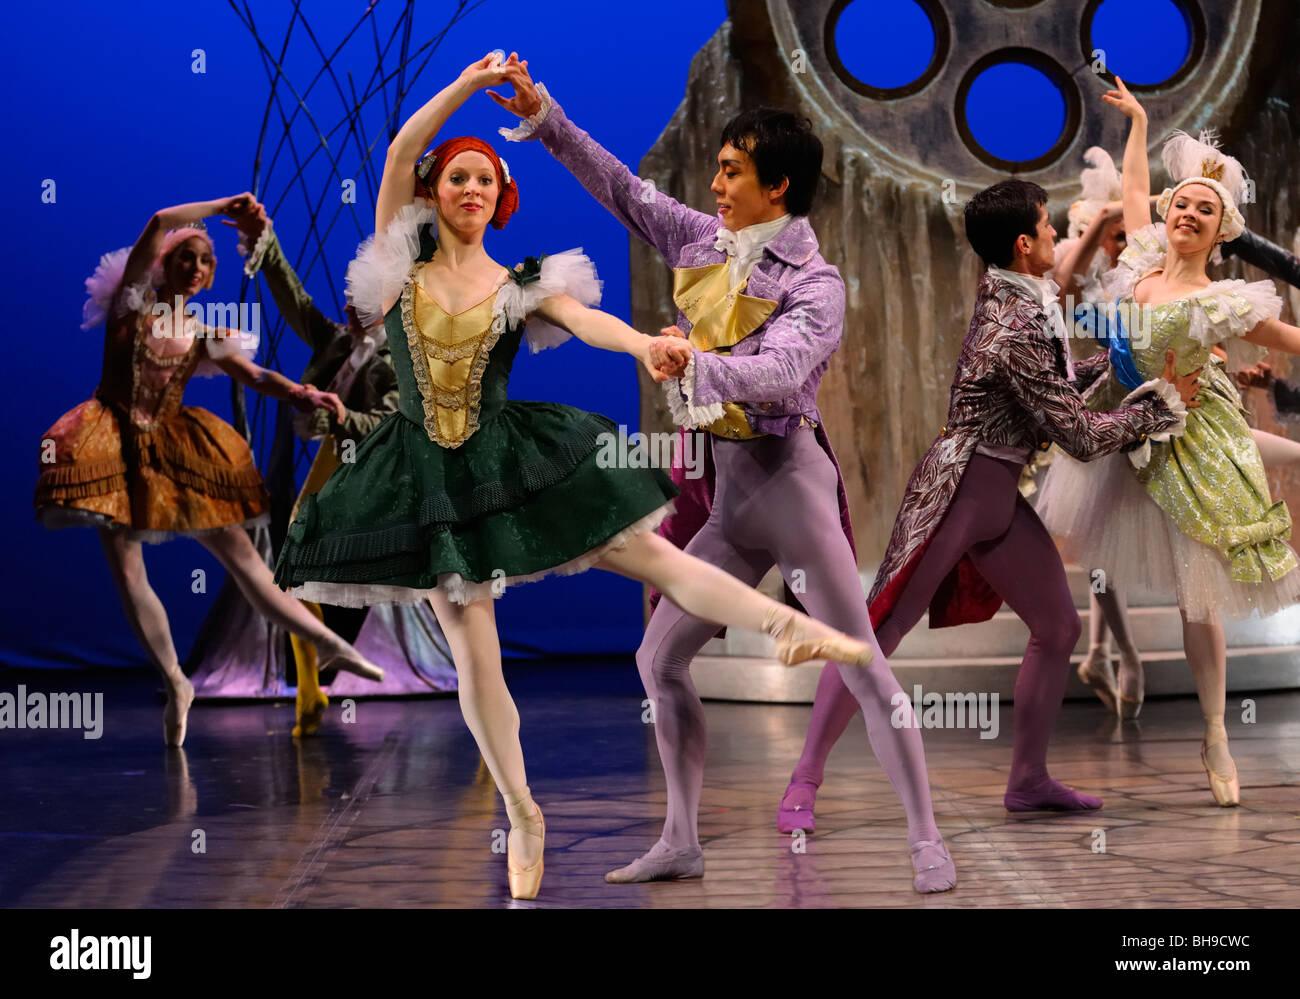 Stepsister ballerinas en pointe and Guests Ballroom dancing in Ballet Jorgen production of Cinderella - Stock Image